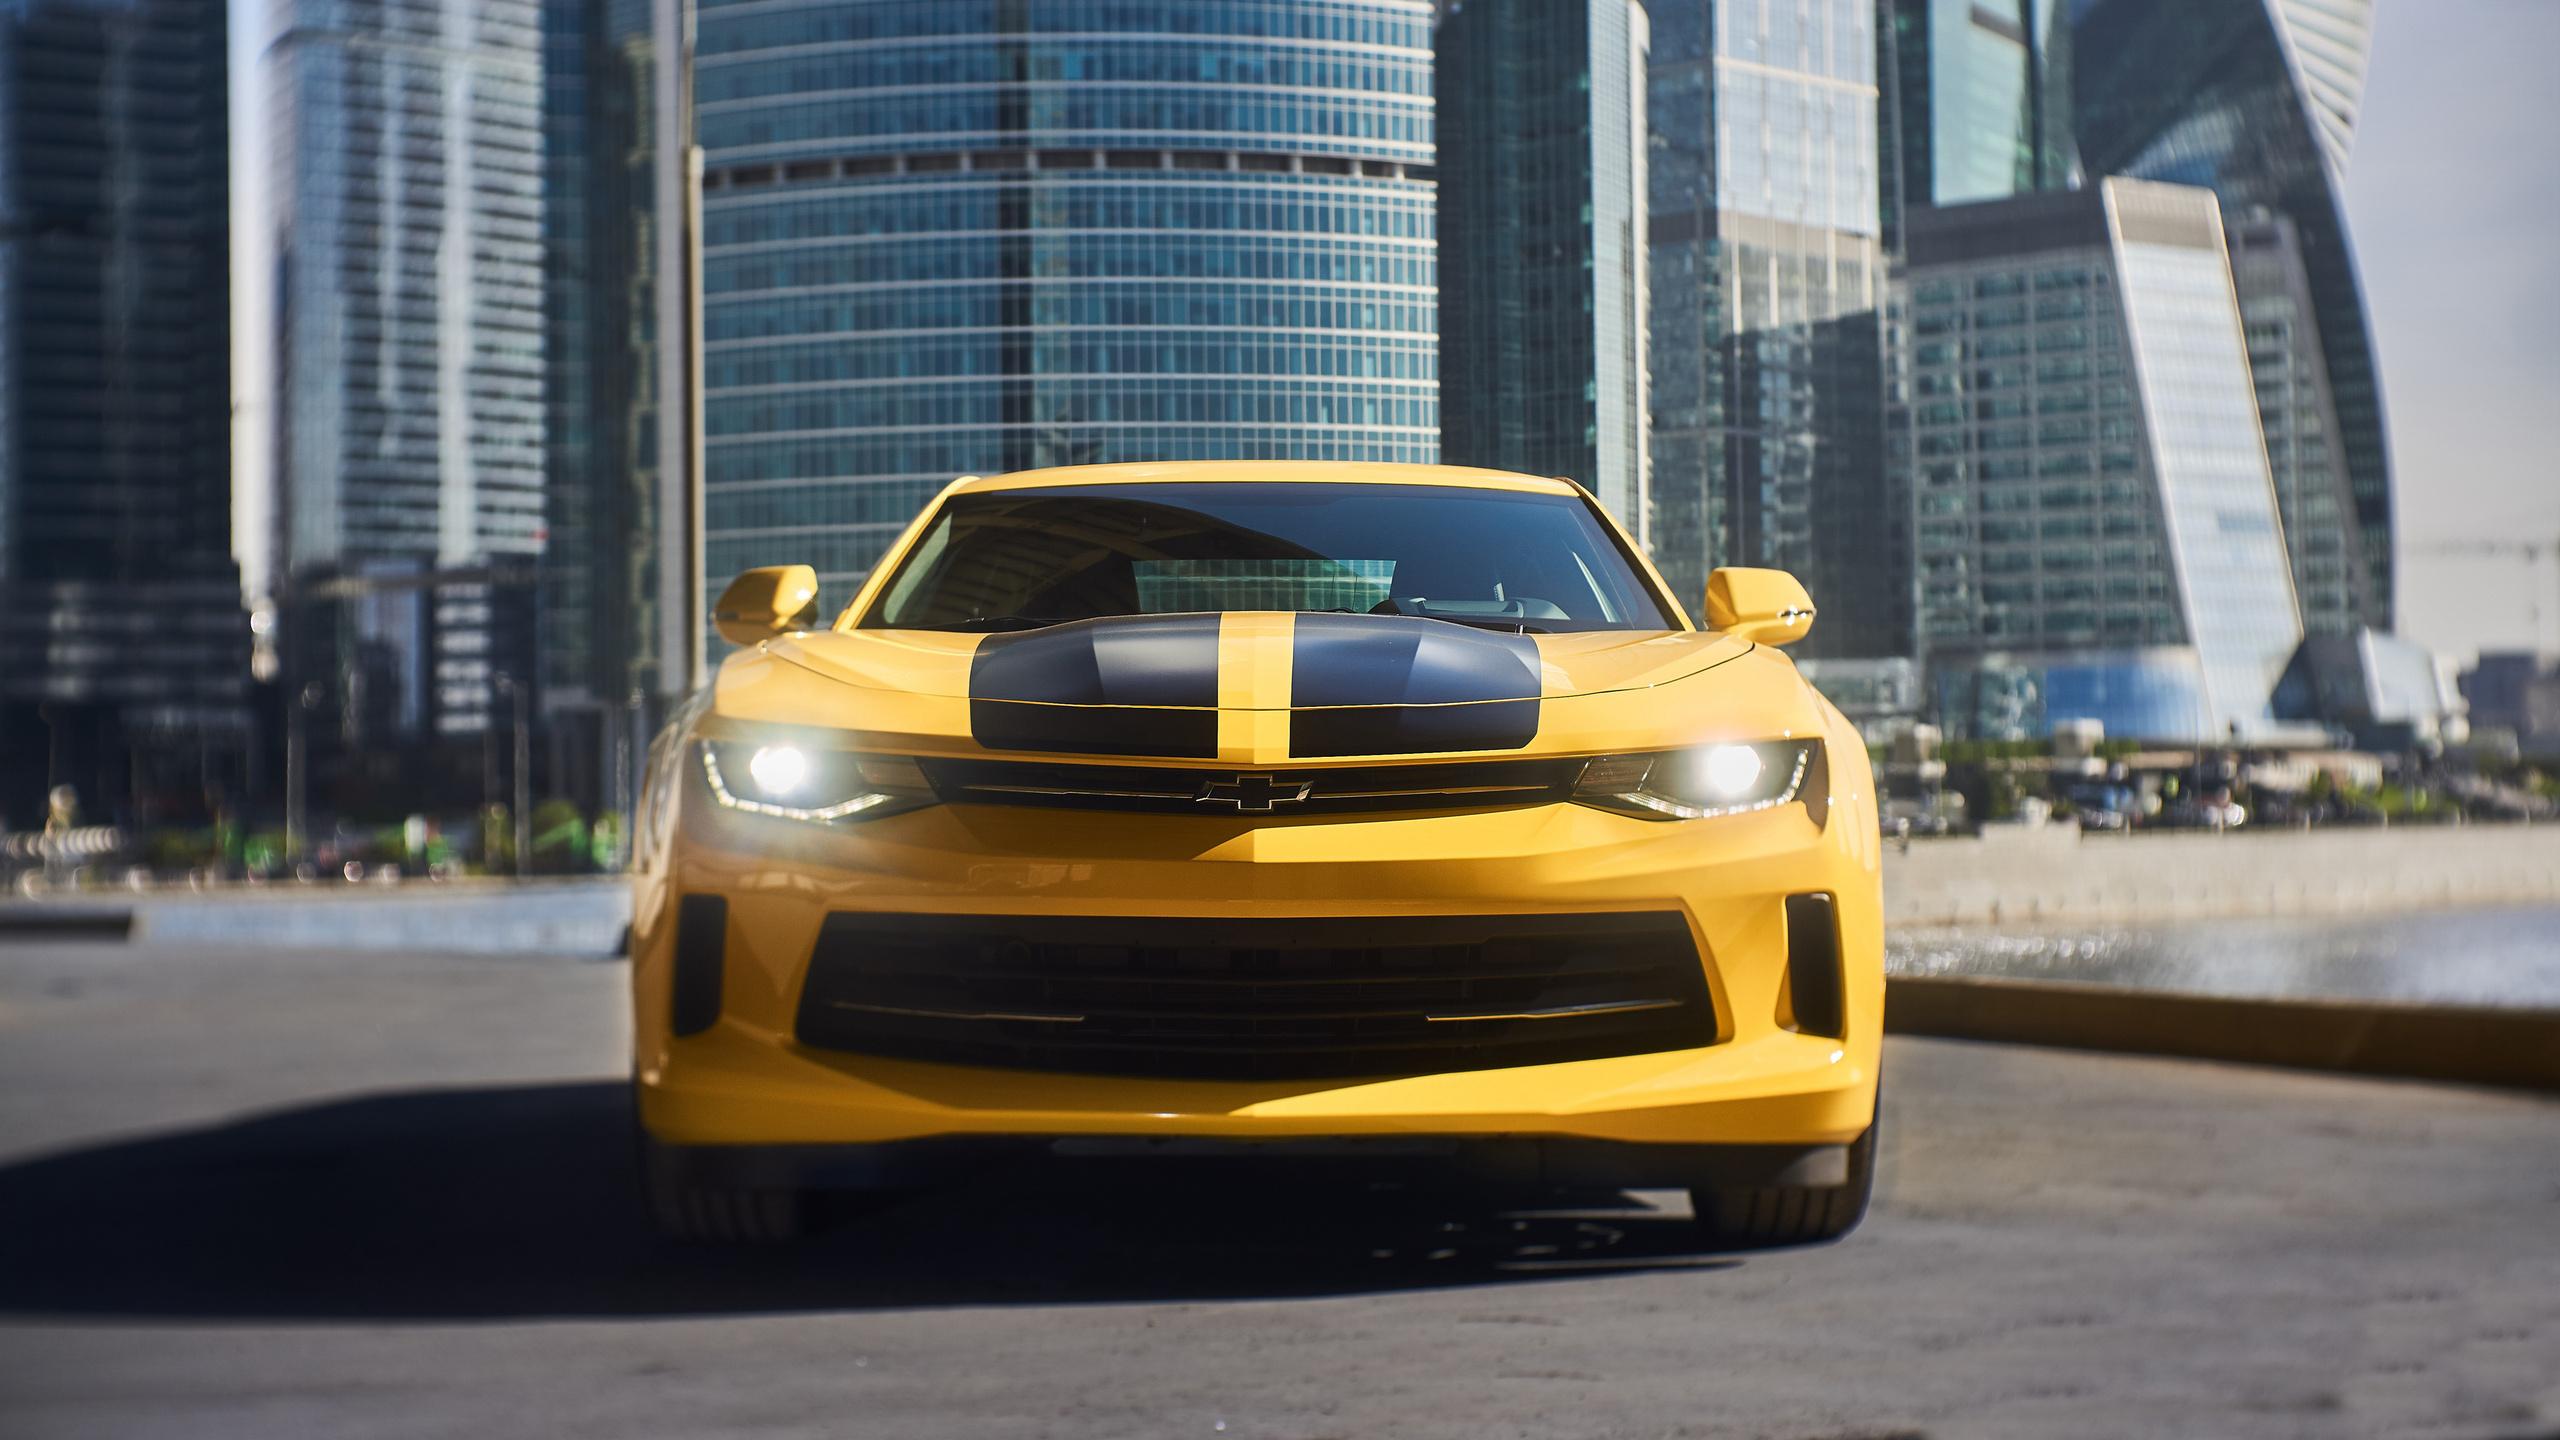 2560x1440 2017 Chevrolet Camaro Performance 1440p Resolution